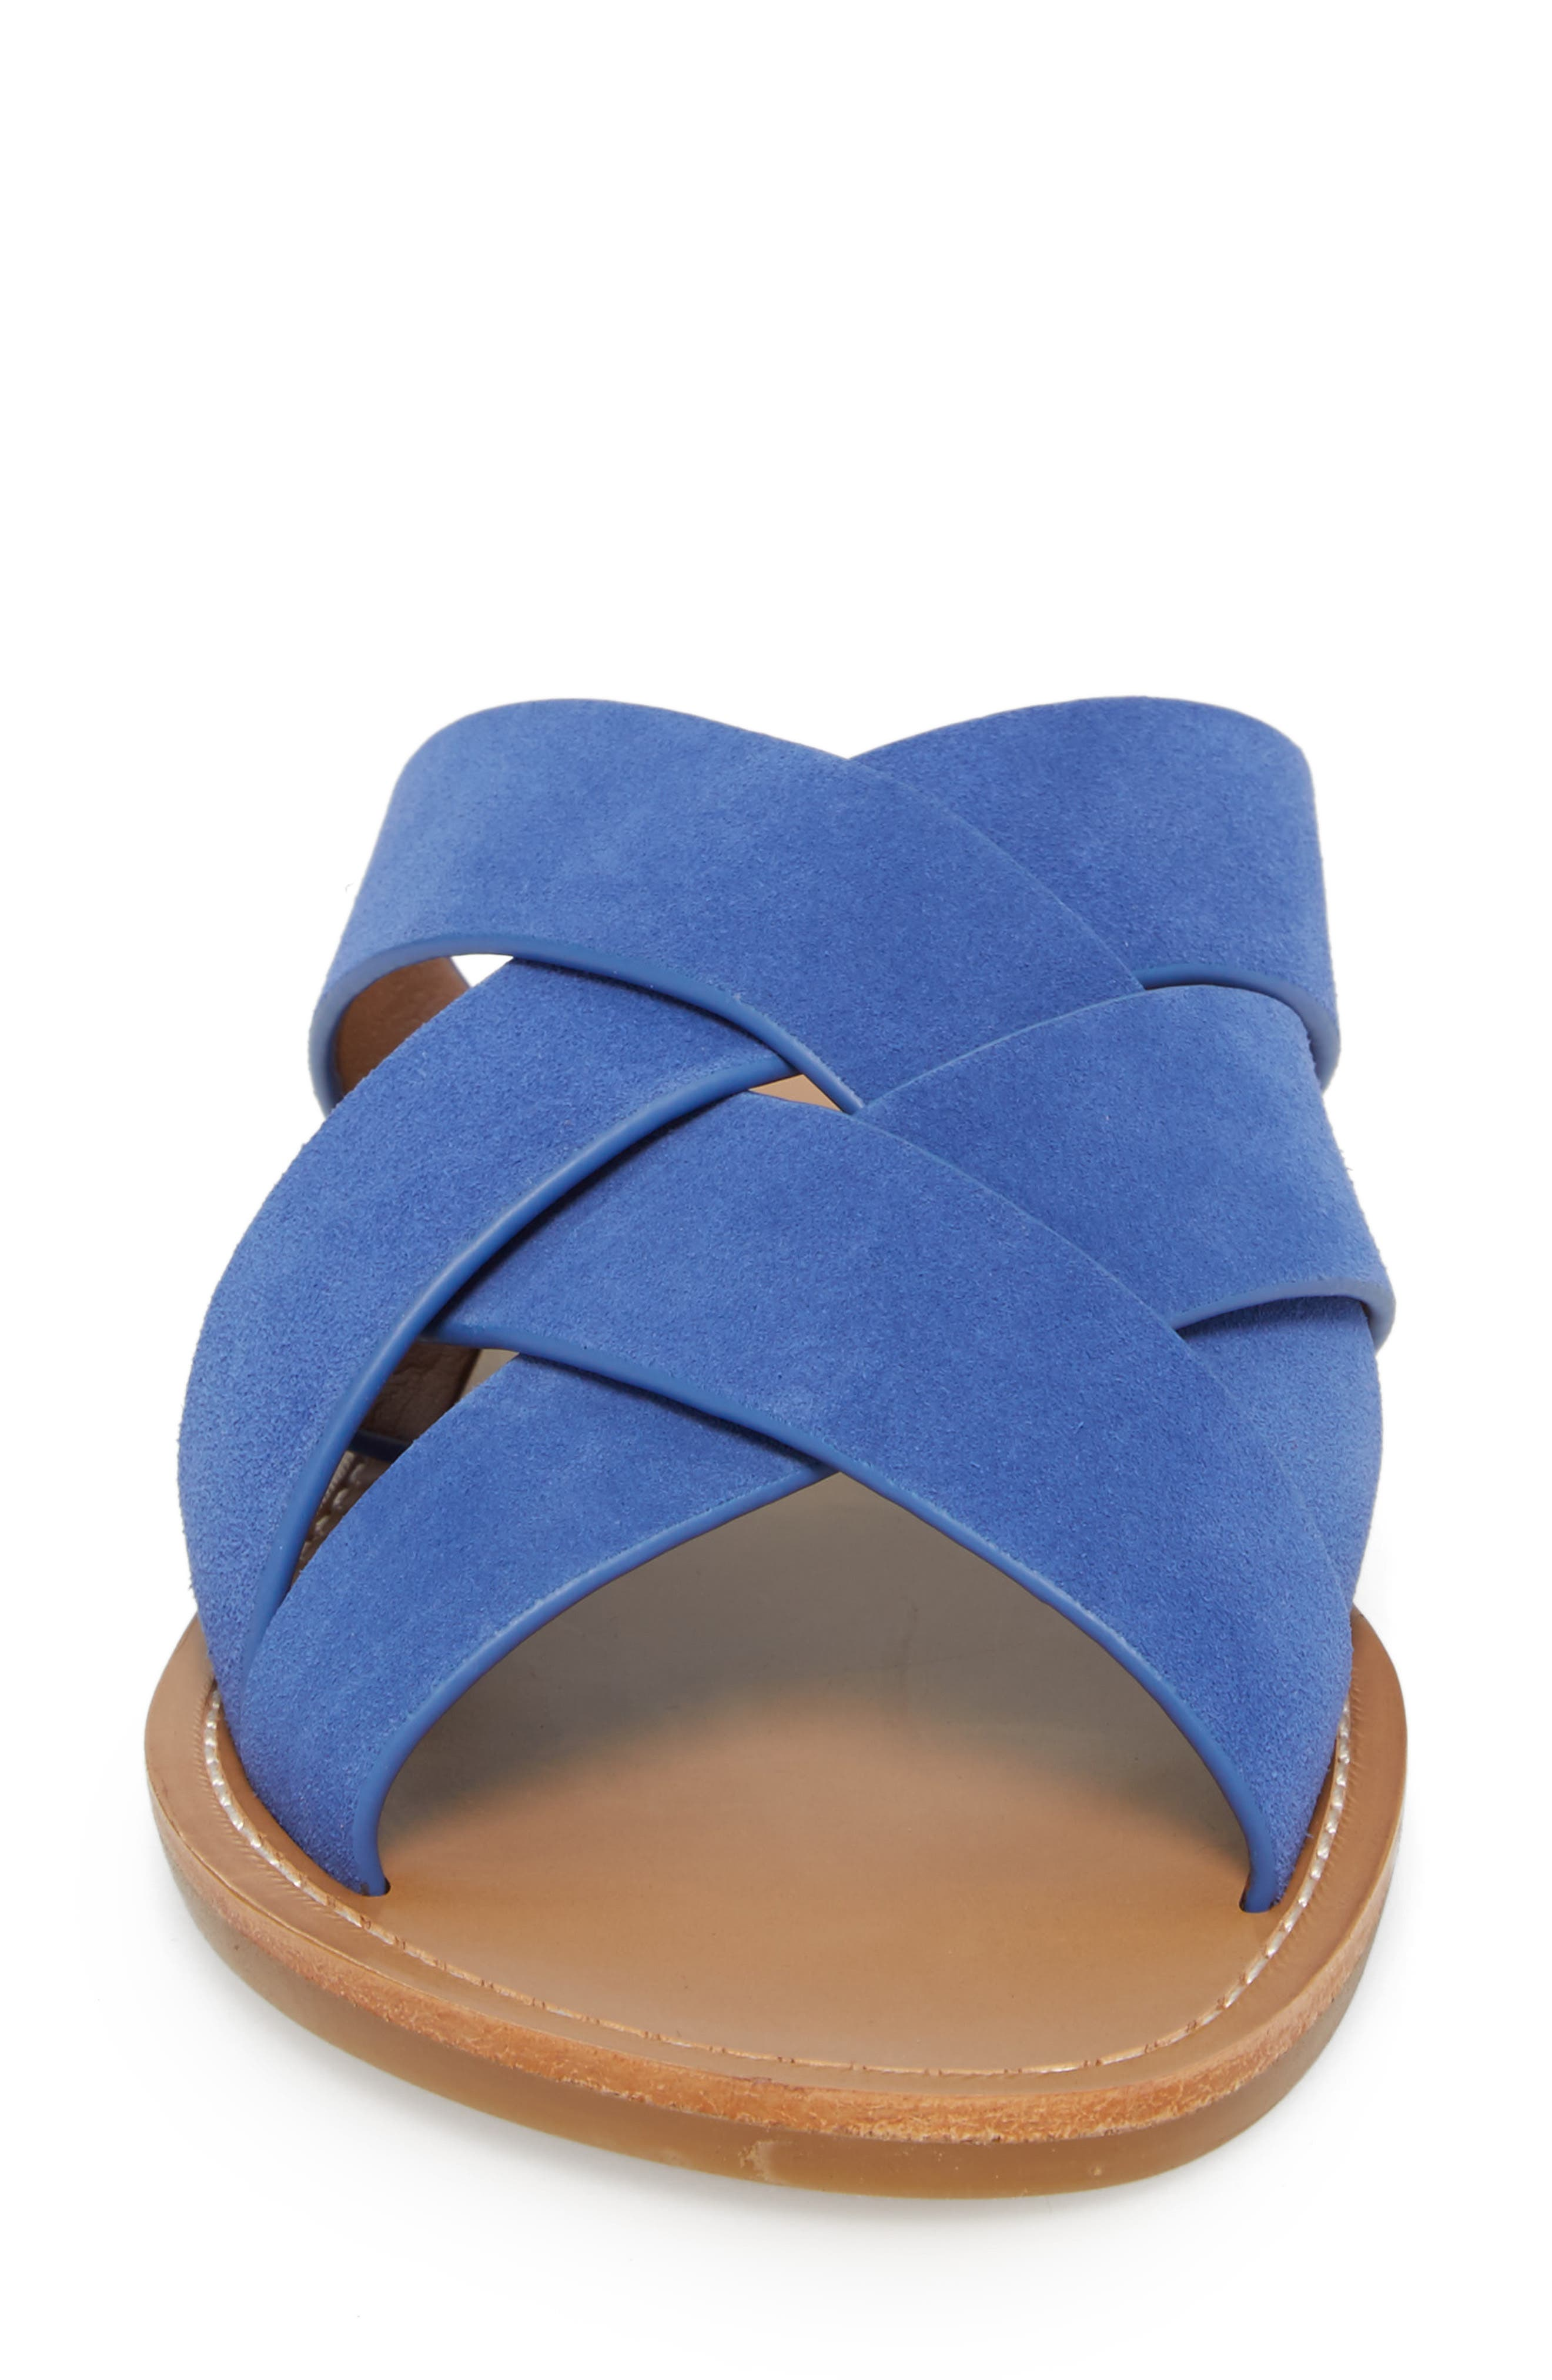 Raida Slide Sandal,                             Alternate thumbnail 18, color,